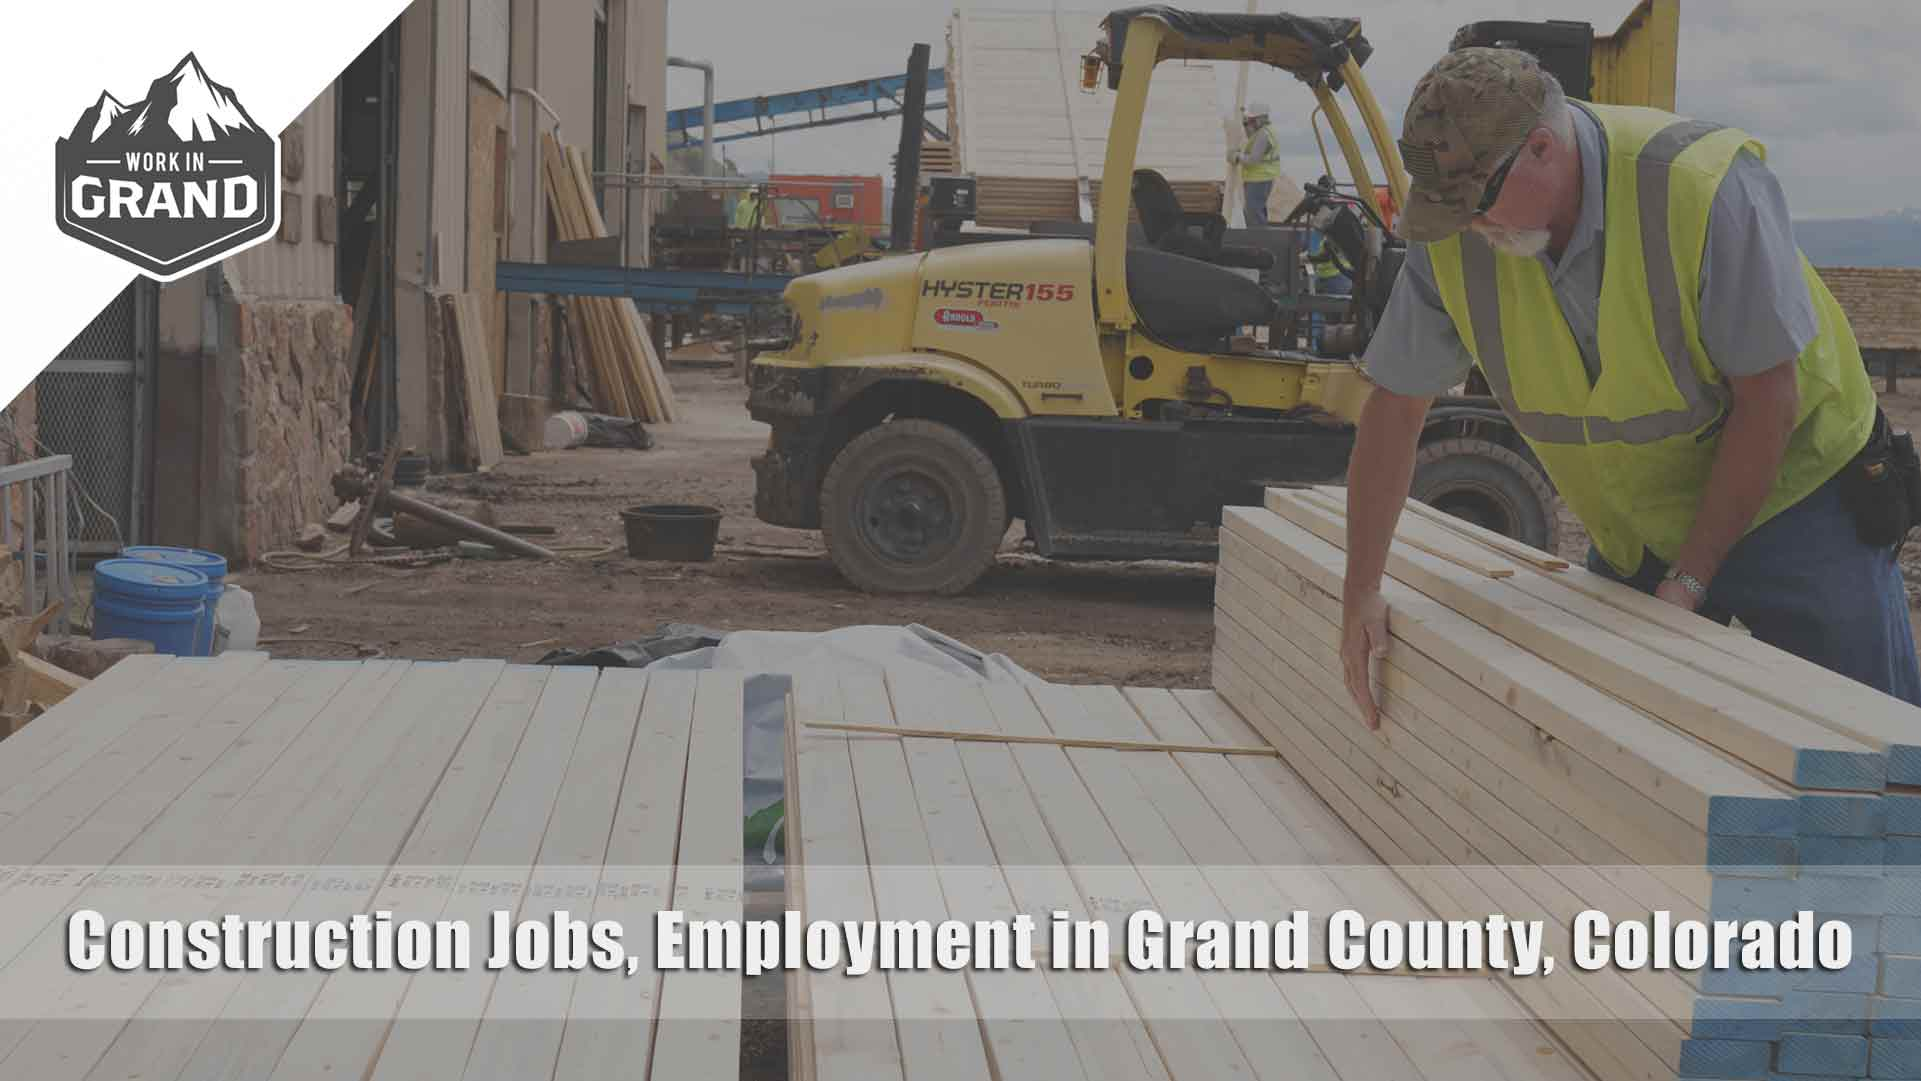 Construction Jobs, Employment in Grand County, Colorado